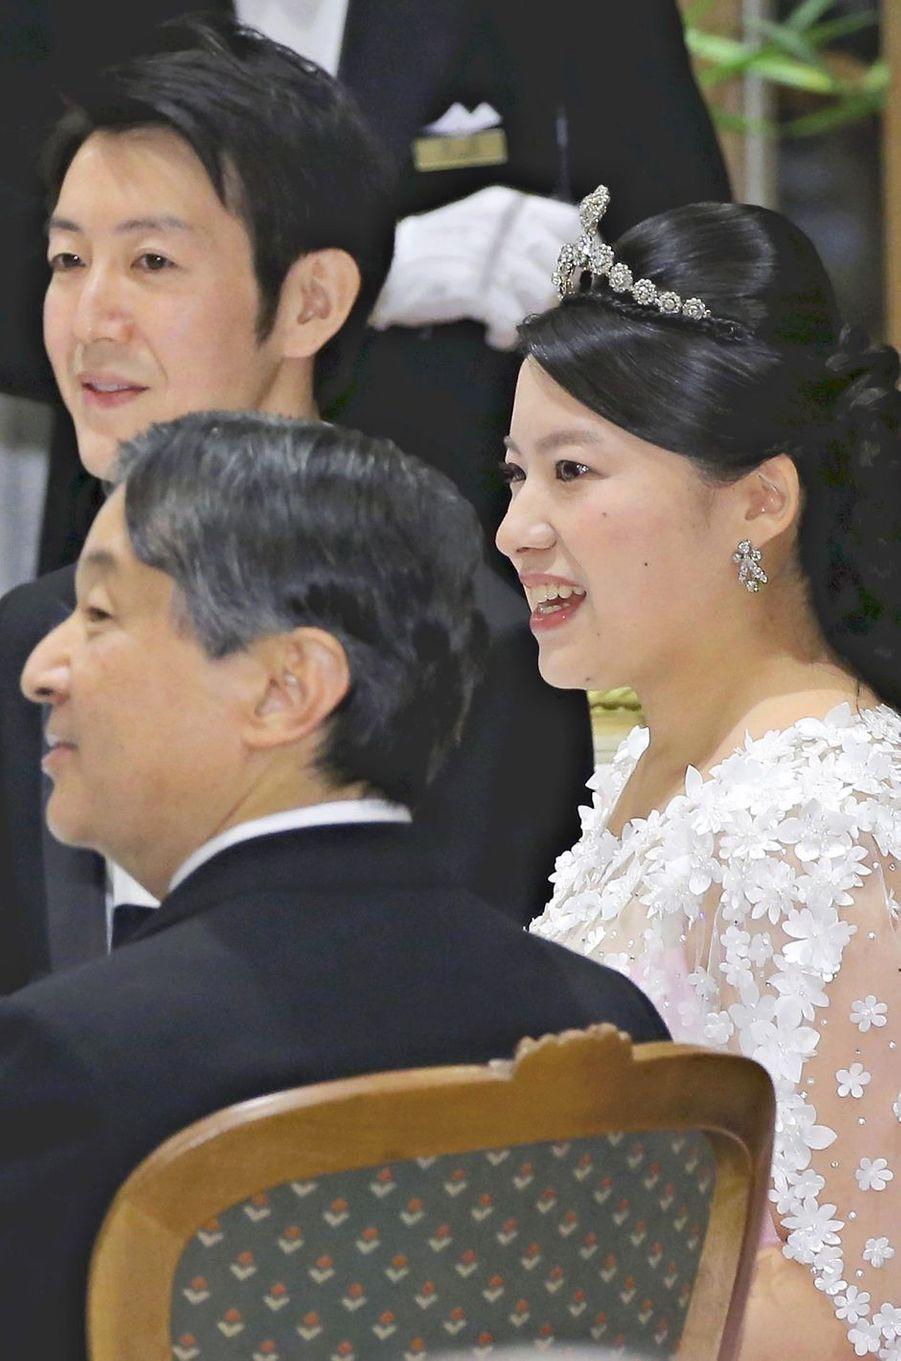 Le prince Naruhito du Japon avec la princesse Ayako et Kei Moriya à Tokyo, le 30 octobre 2018